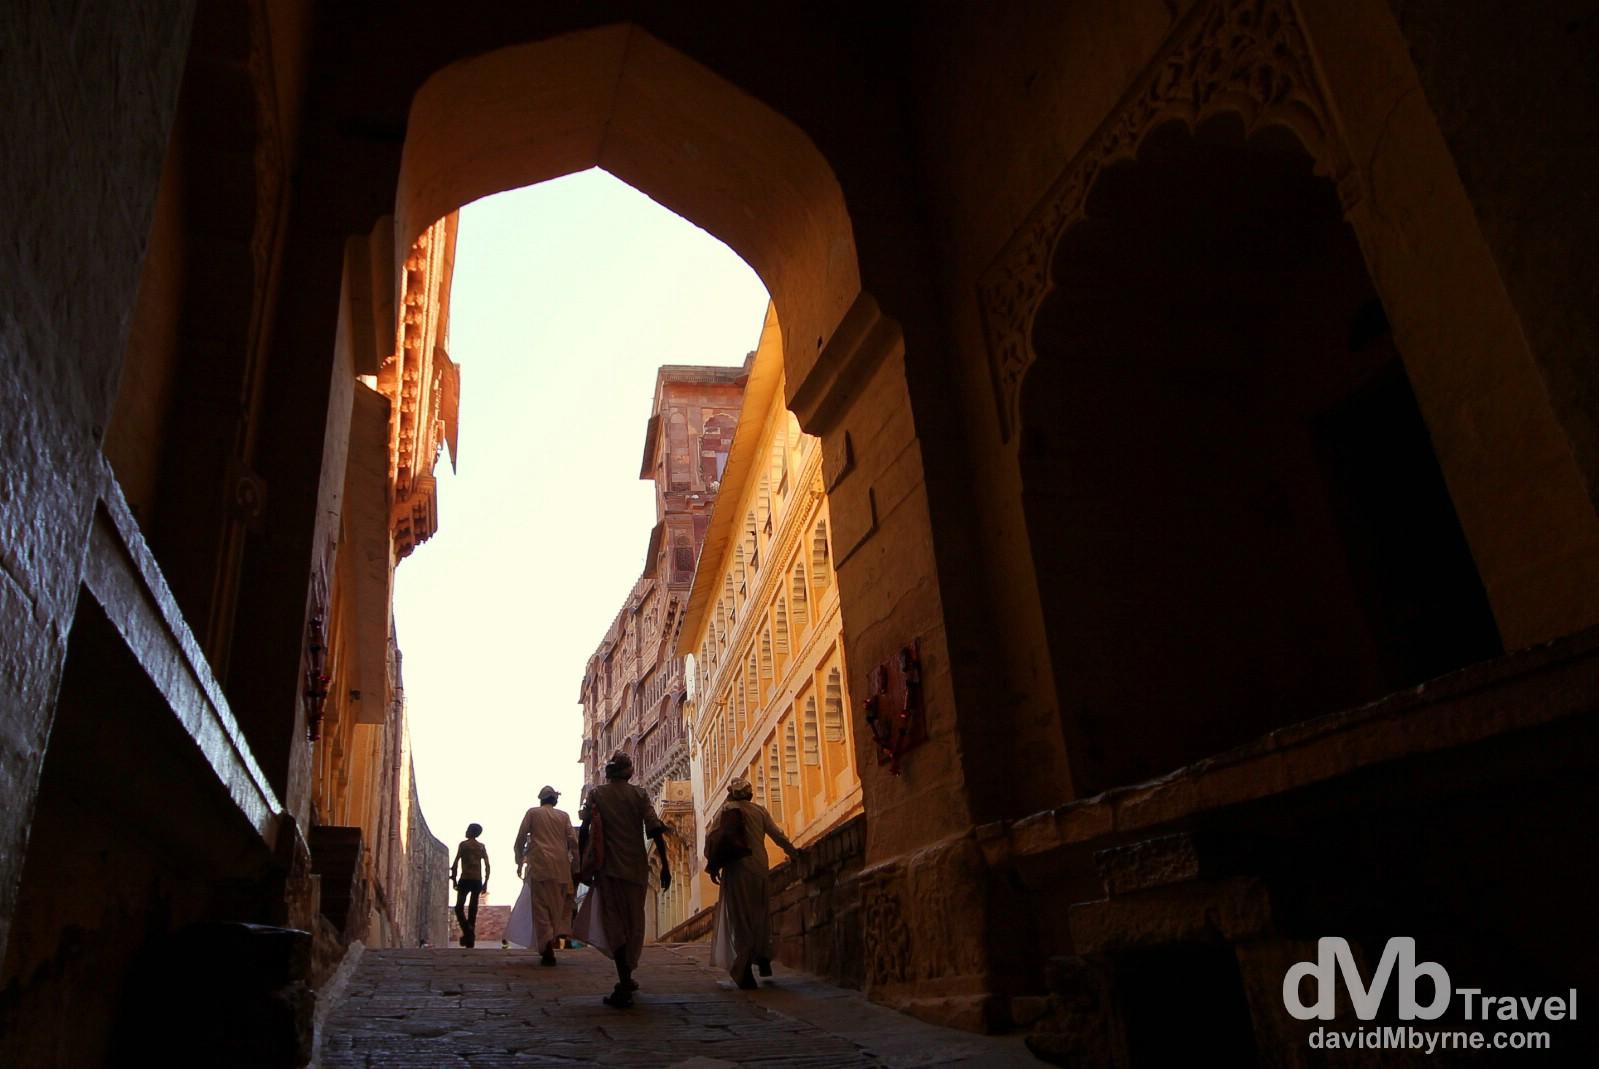 Walking up the rampart through the Lohapol (Iron) Gate of Meherangarh Fort, Rajasthan, India. October 5th 2012.